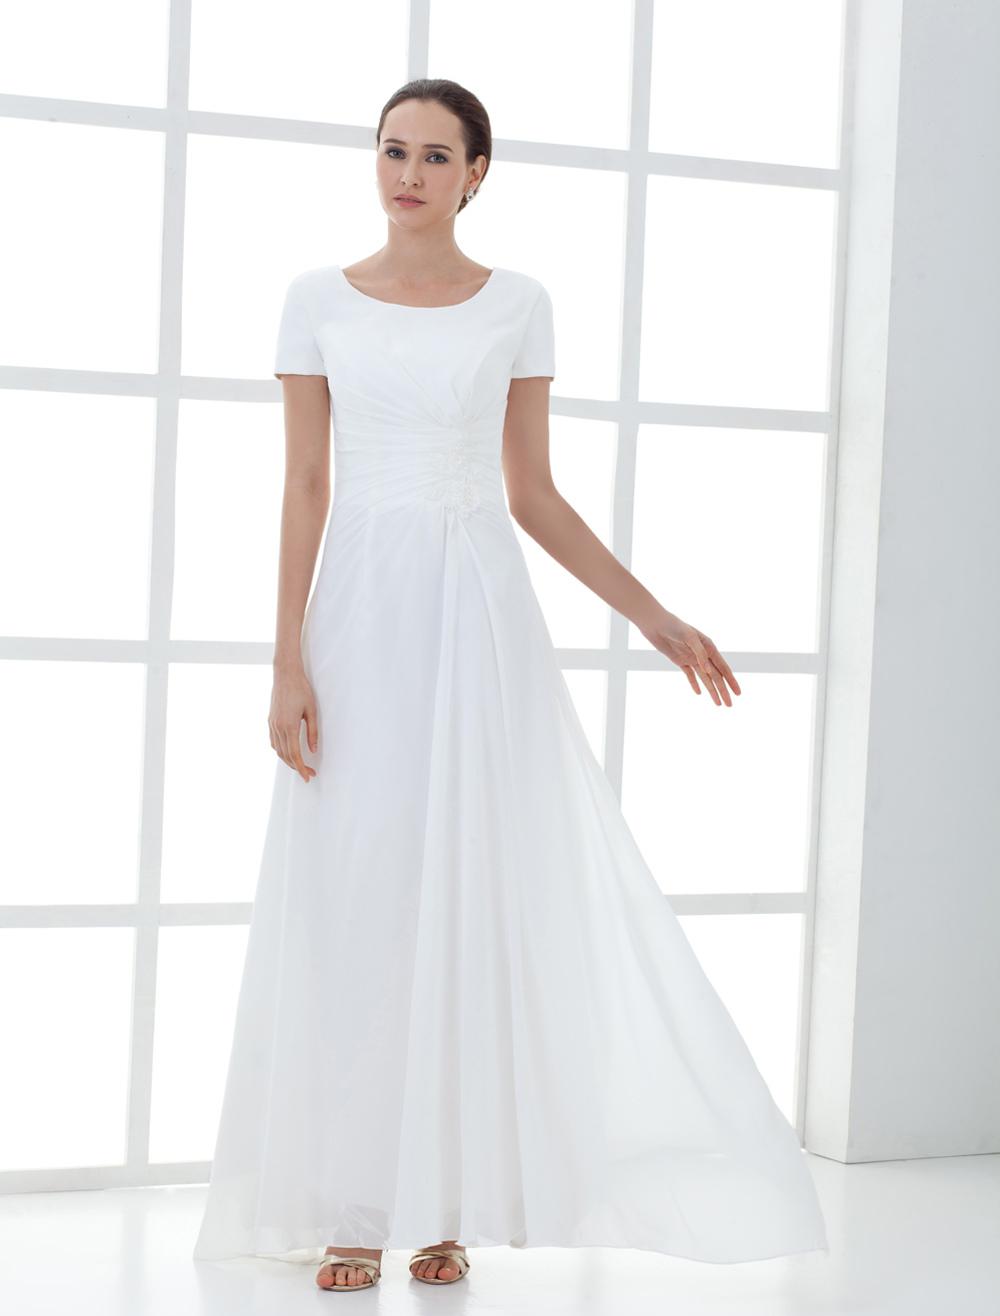 Beautiful White Short Sleeve Pleated Chiffon Mother of the Bride Dress (Wedding) photo